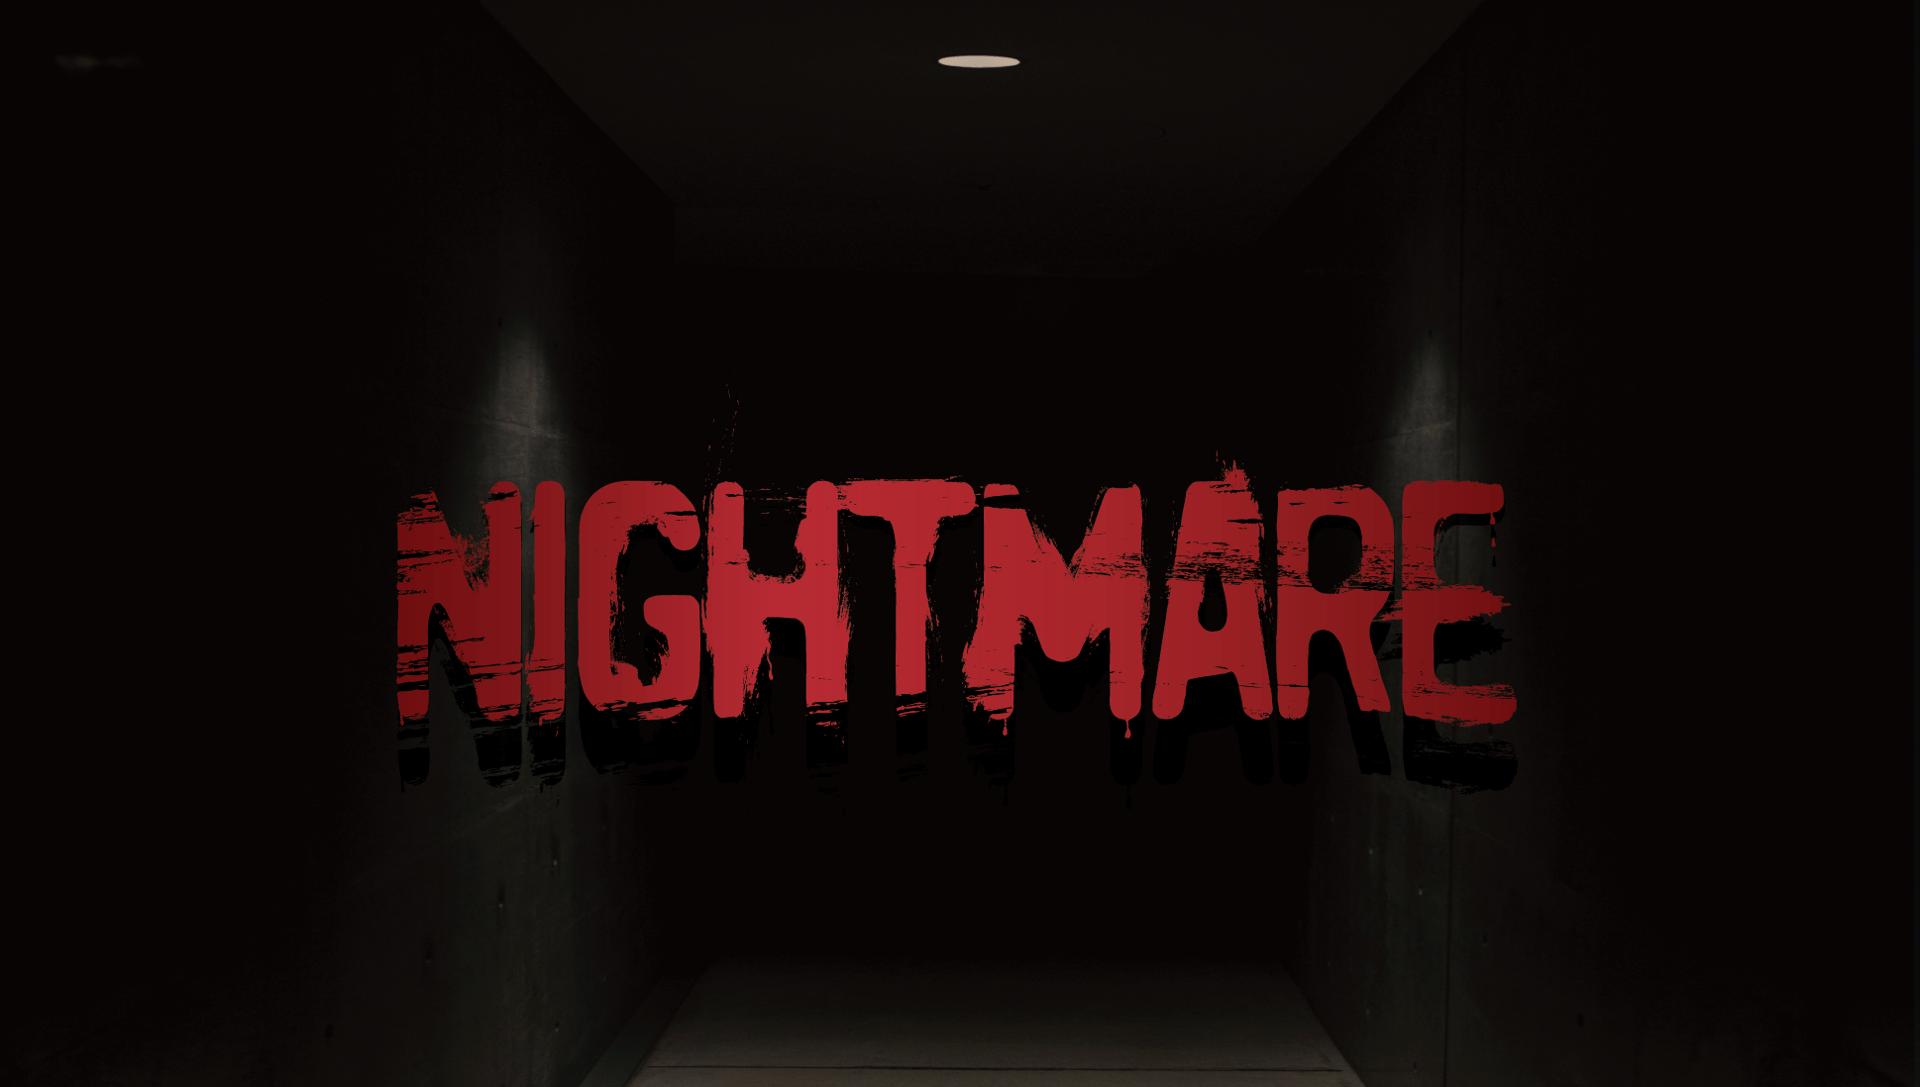 NIghtmare-frightfest-frontiercity